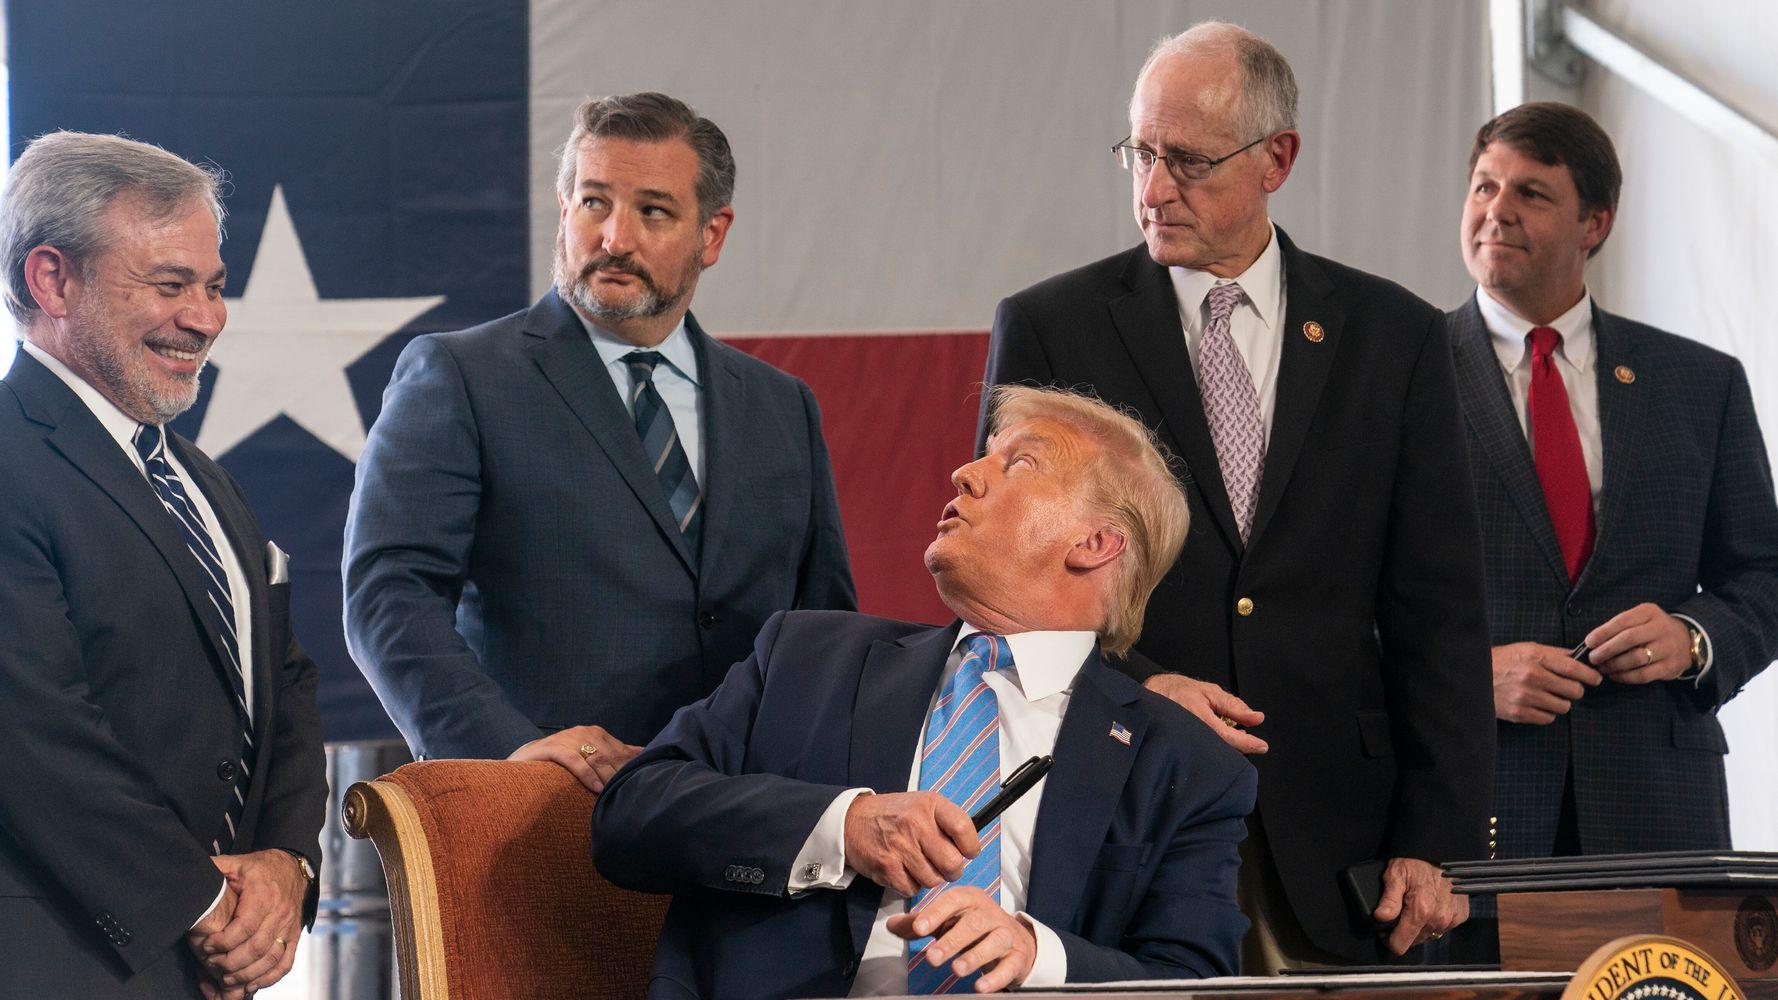 Infectious Disease Expert Laments 'Distressing' Lack Of Masks At Trump Event 1